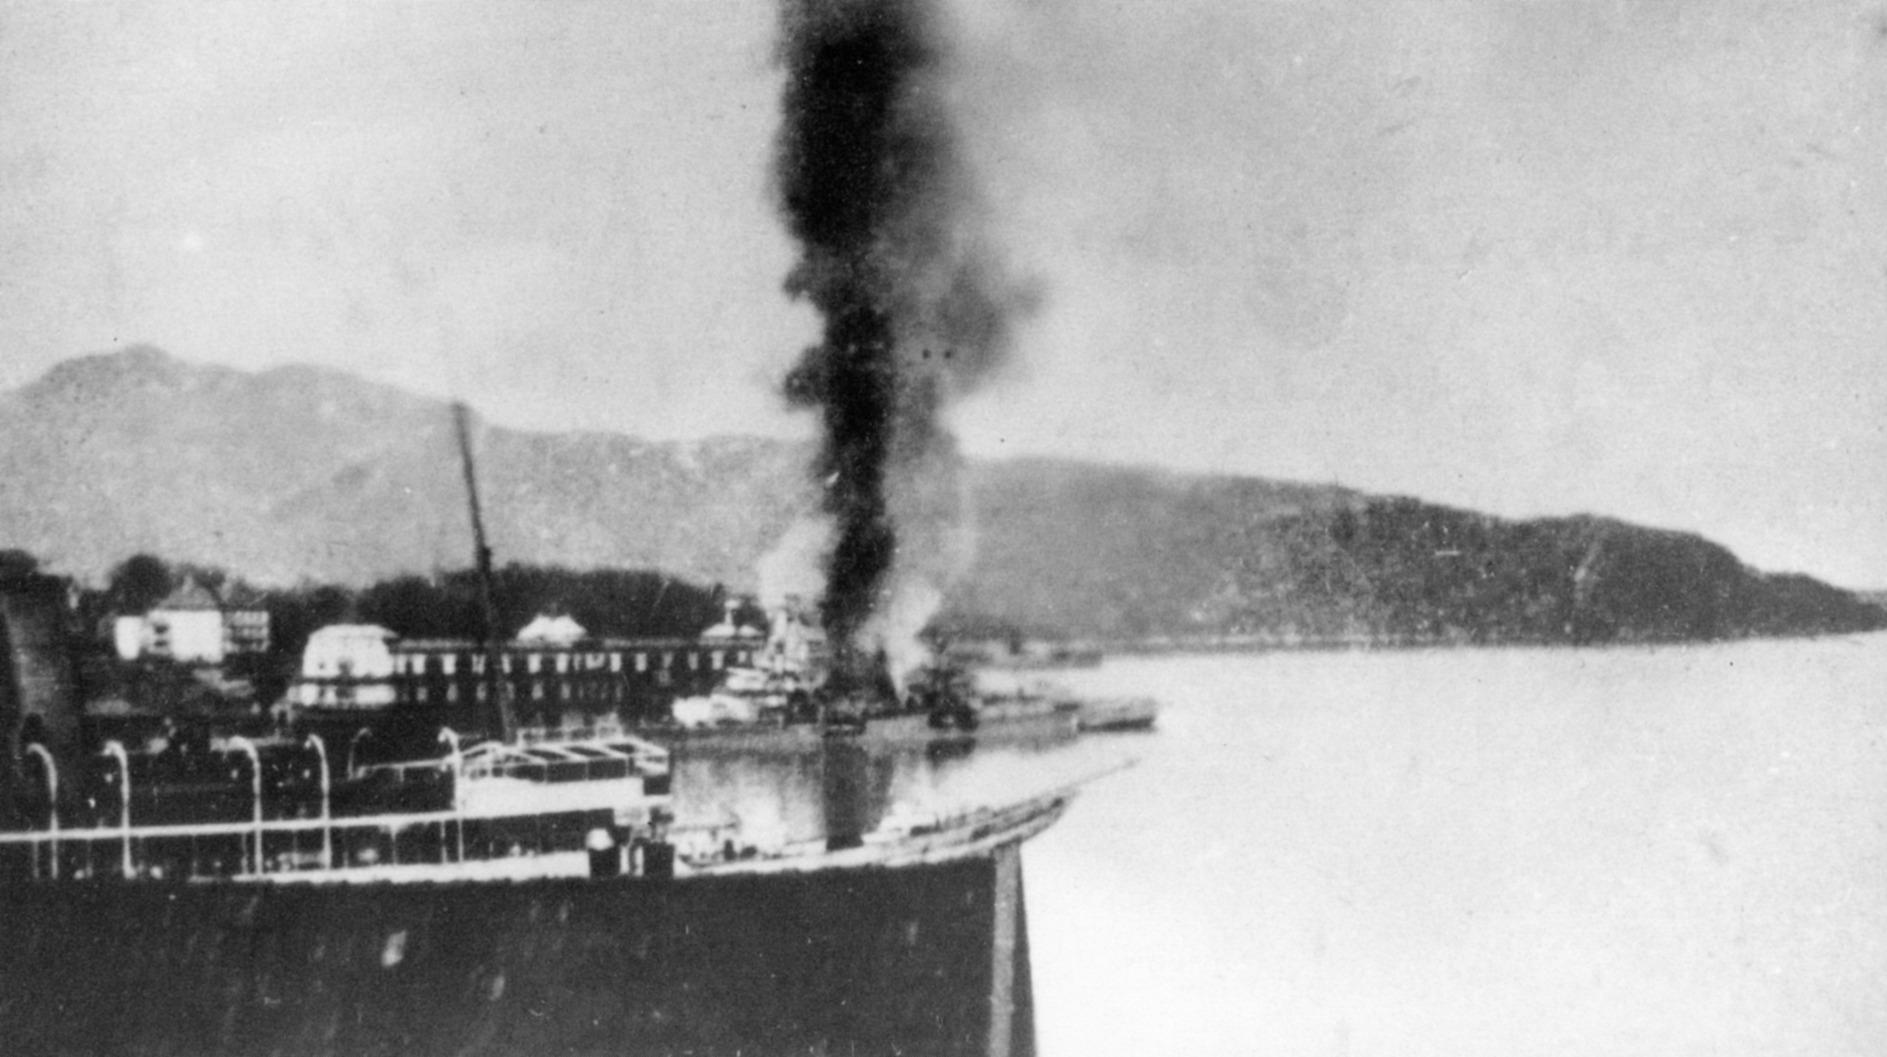 Konigsberg burning 10.4.40 view from sea.JPG